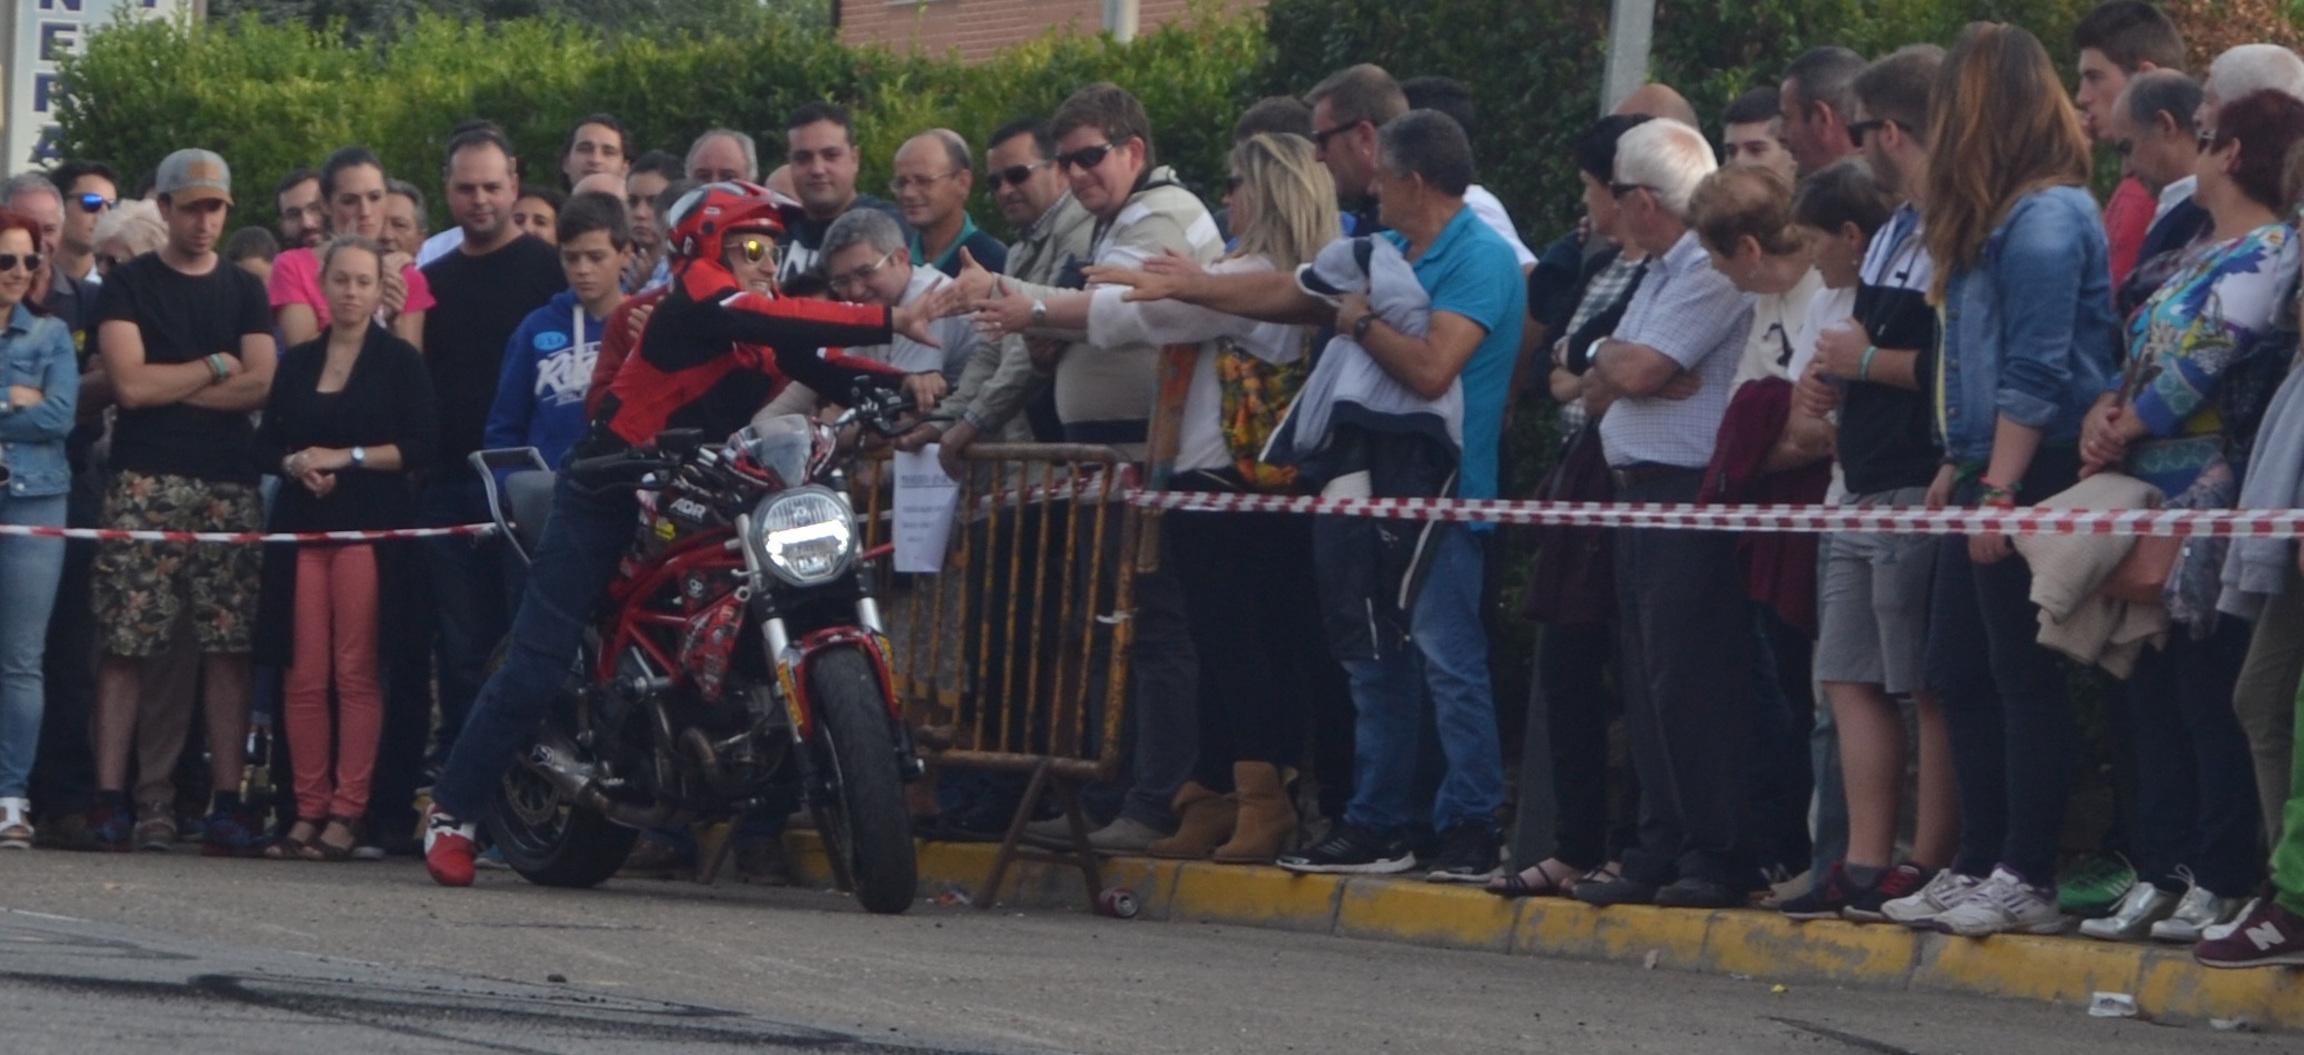 35_SALDAÑA_PALENCIA_EMILIO_ZAMORA_DUCATI_STUNT_TEAM_MOTOR_SOHW_ESPECTACULO_MOTOCICLISMO_EXHIBICION_2017_MONSTER_CABALLITO_WHEELIE_INVERTIDO_DRIFT_QUAD